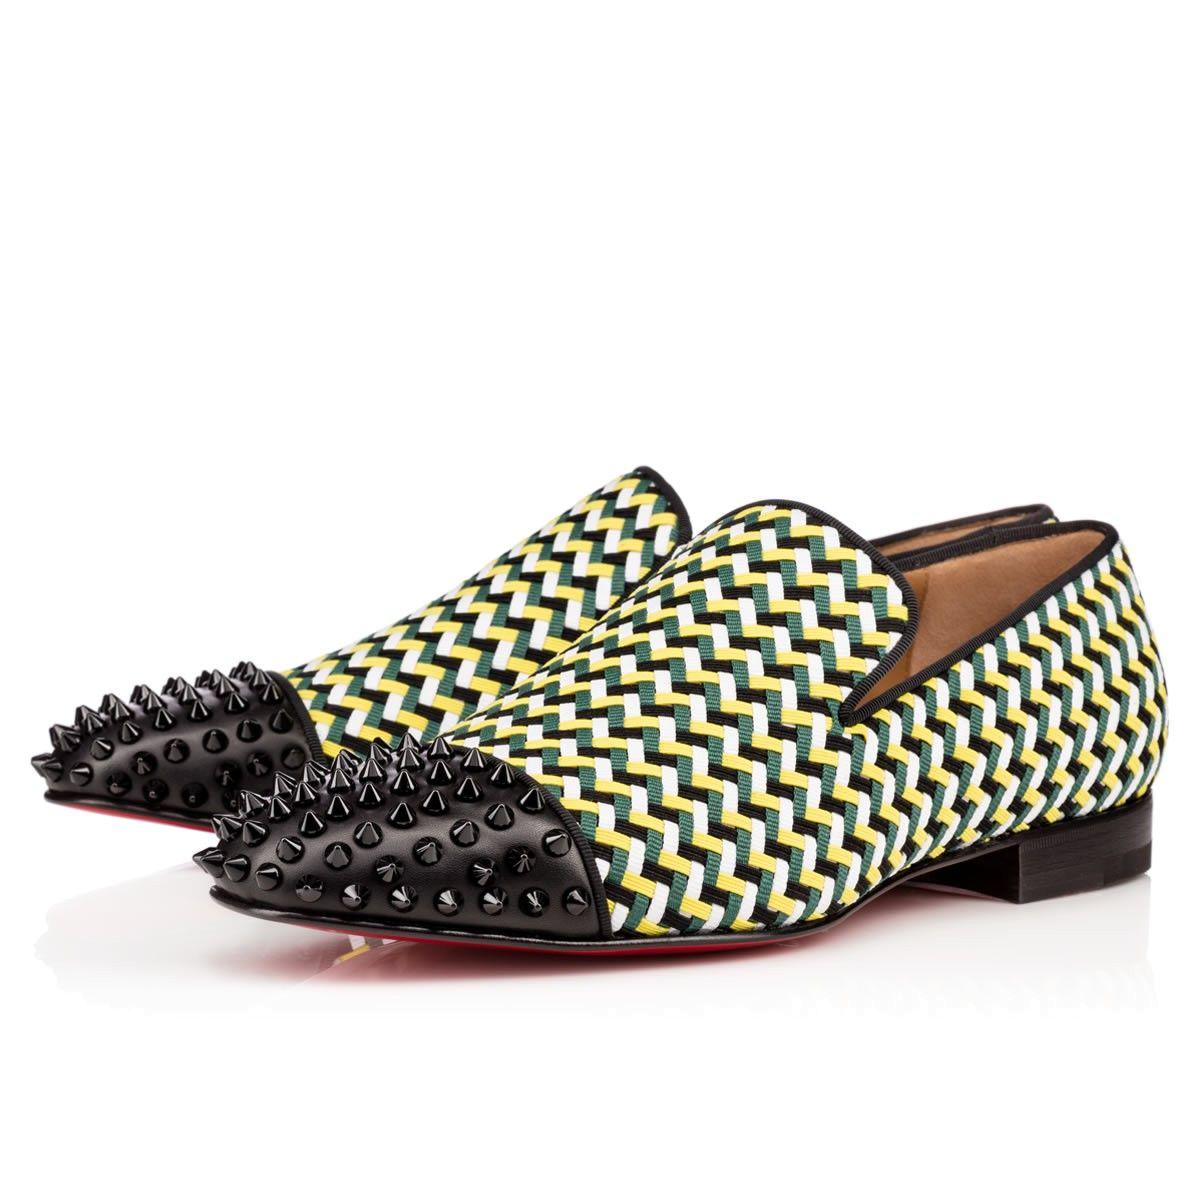 949b7705c9 Shoes - Spooky Flat - Christian Louboutin